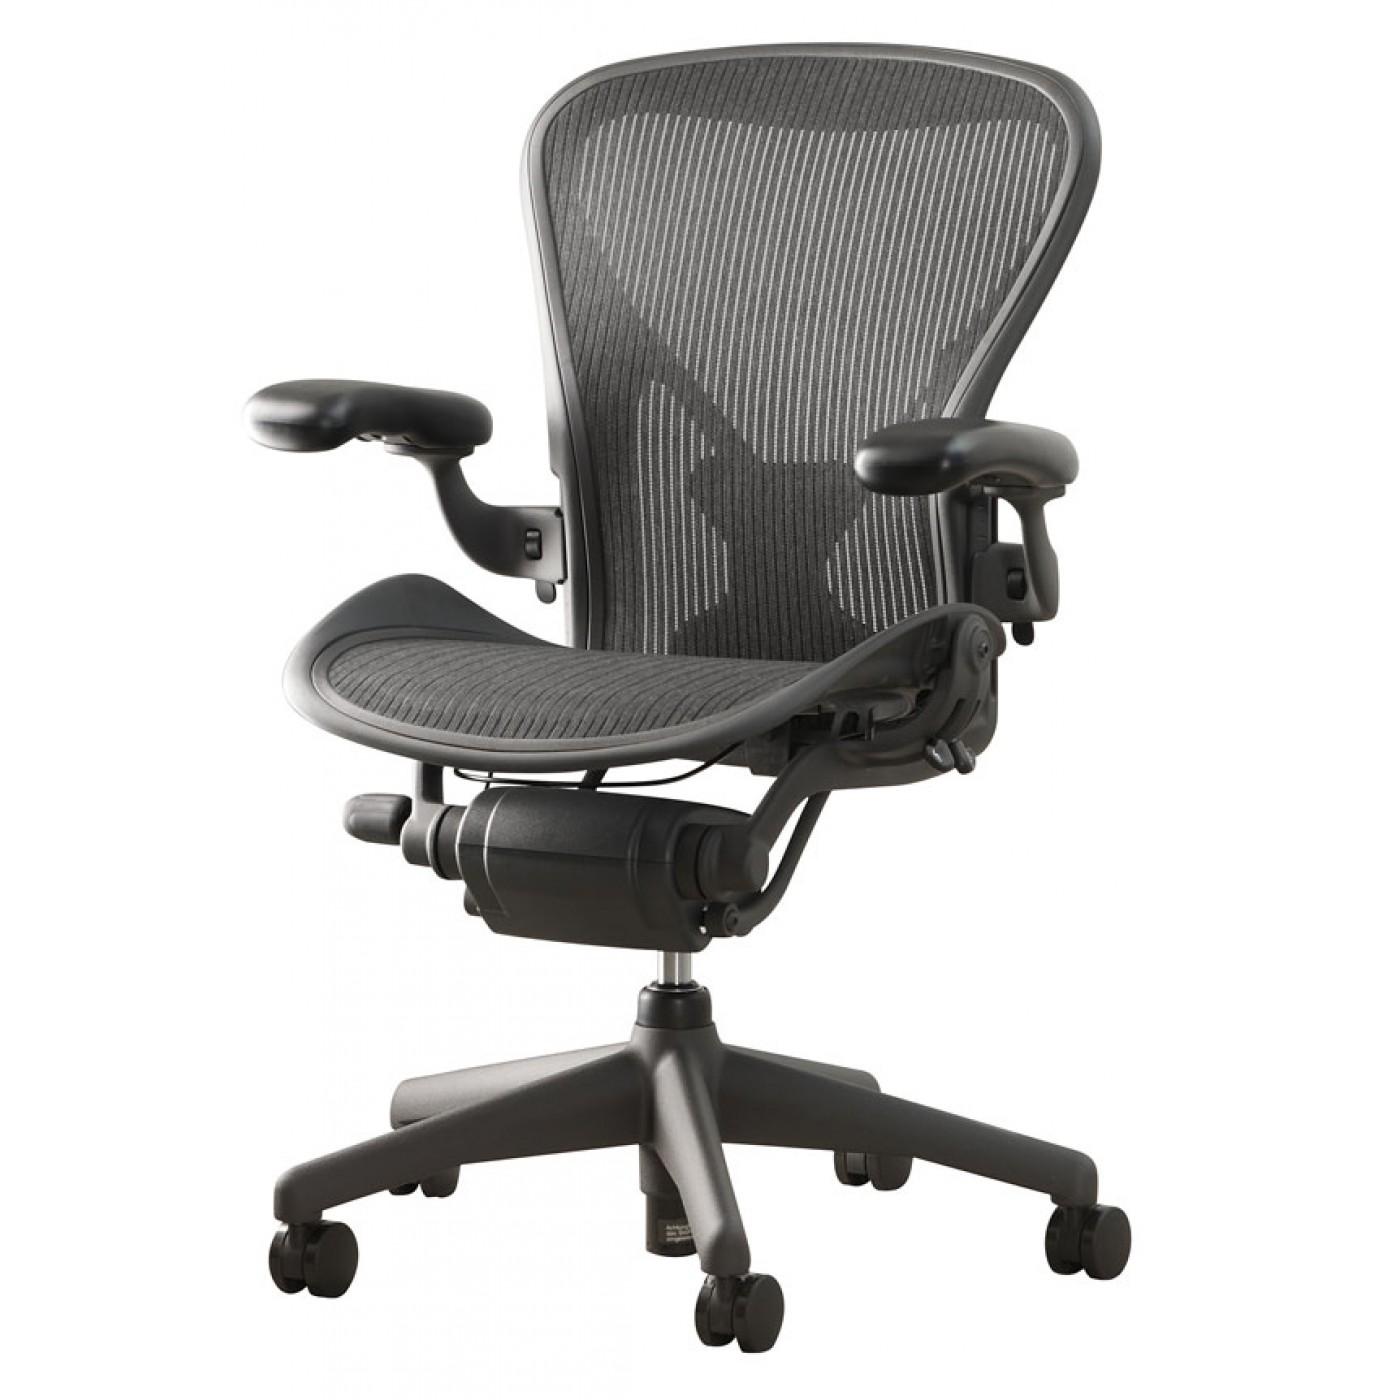 https://www.valueshop.dk/media/catalog/product/7/4/7485.herman-miller-aeron-chair.jpg